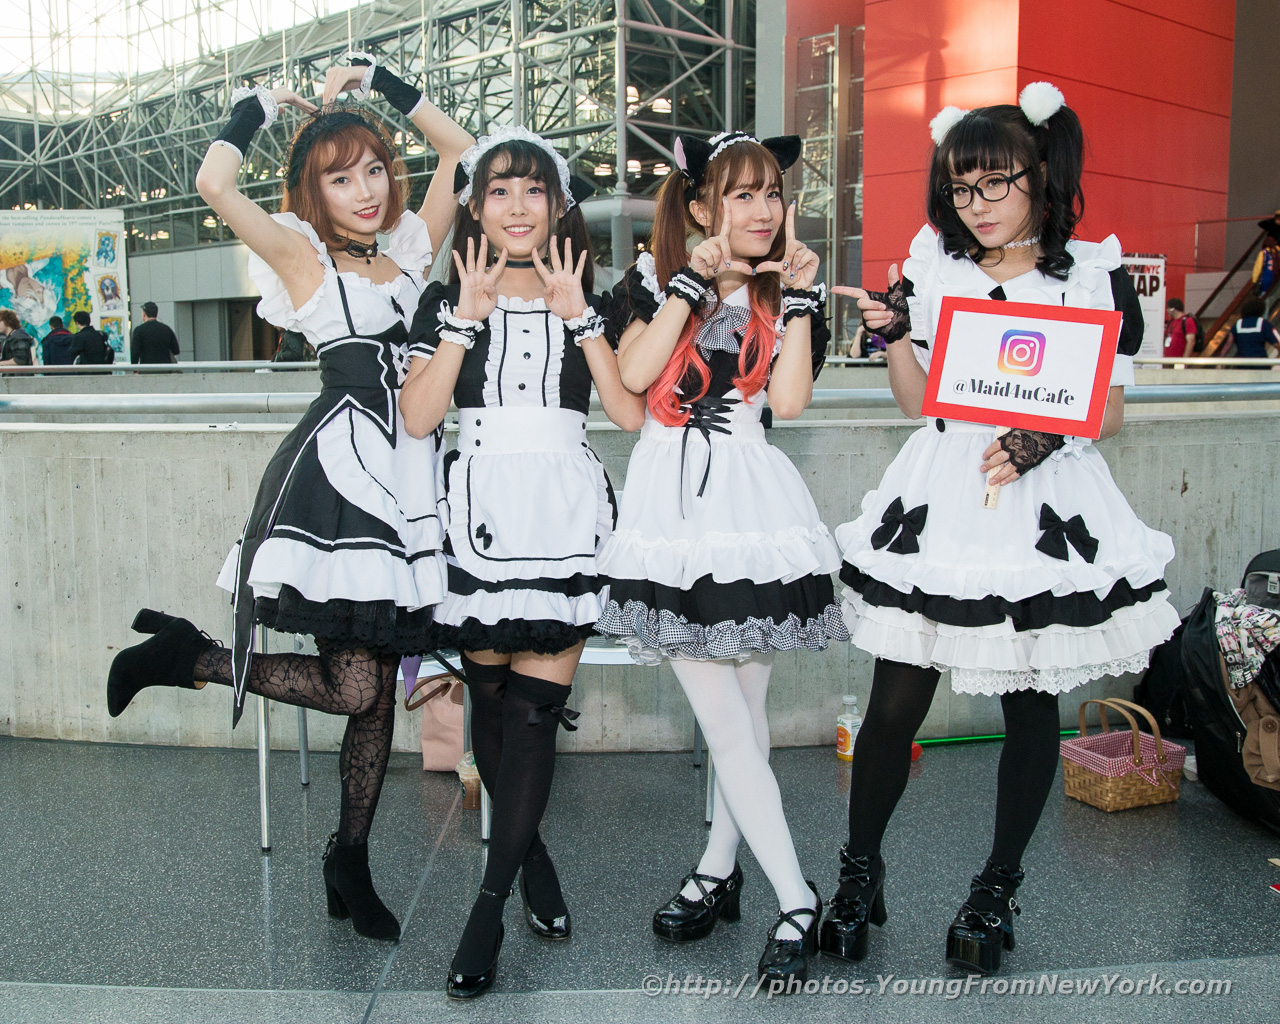 111718_AnimeNYC_Cosplay-051_1280mk.jpg